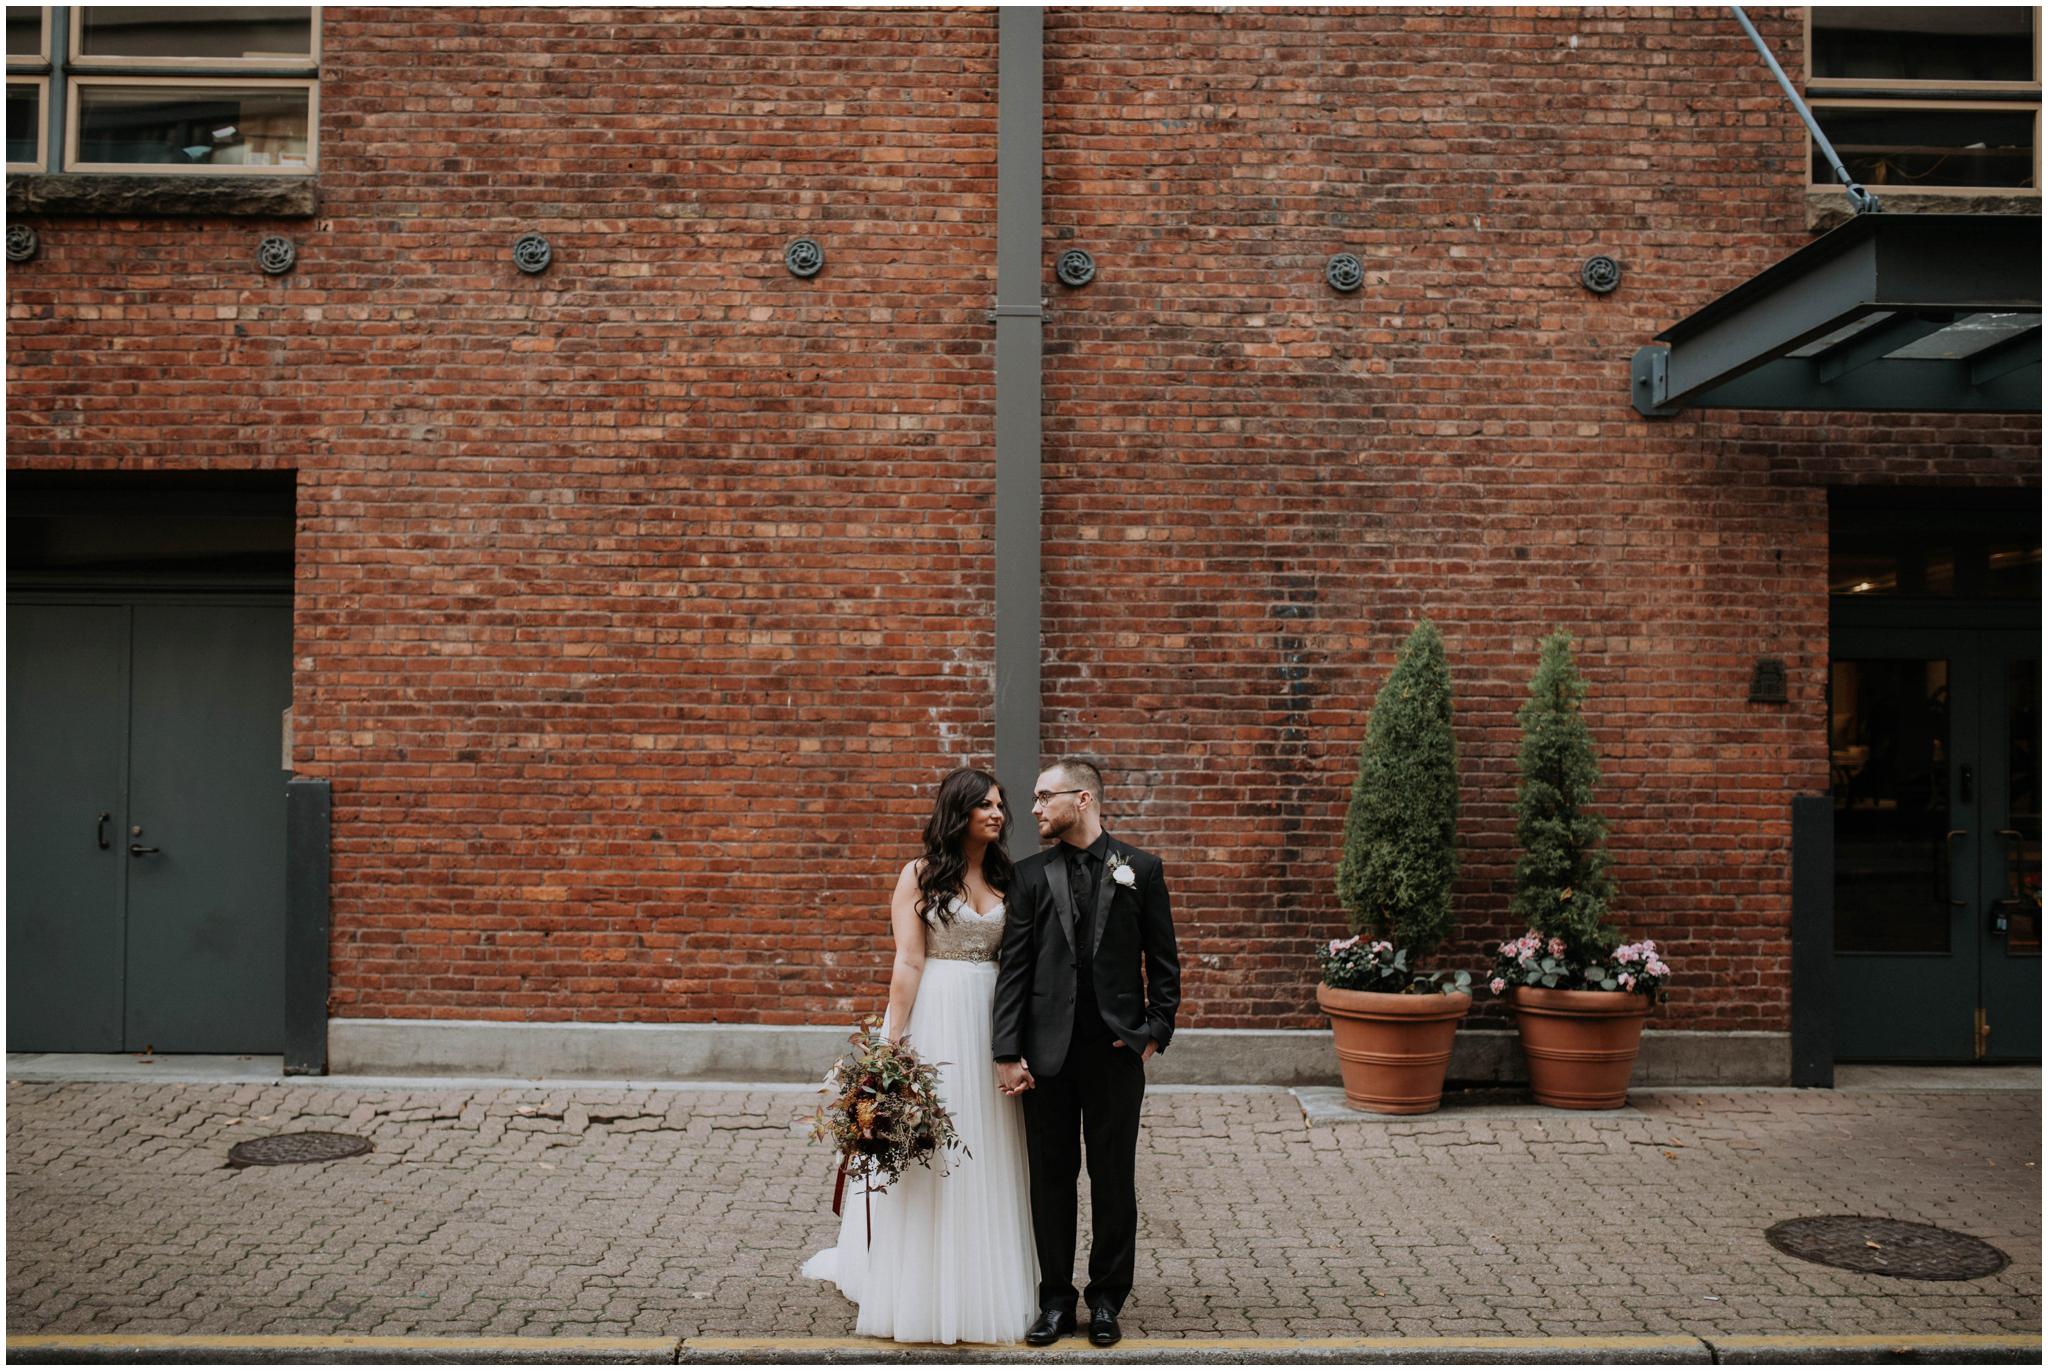 danny+mackenzie+downtown-seattle-axis-wedding-seattle-photographer-035.jpg